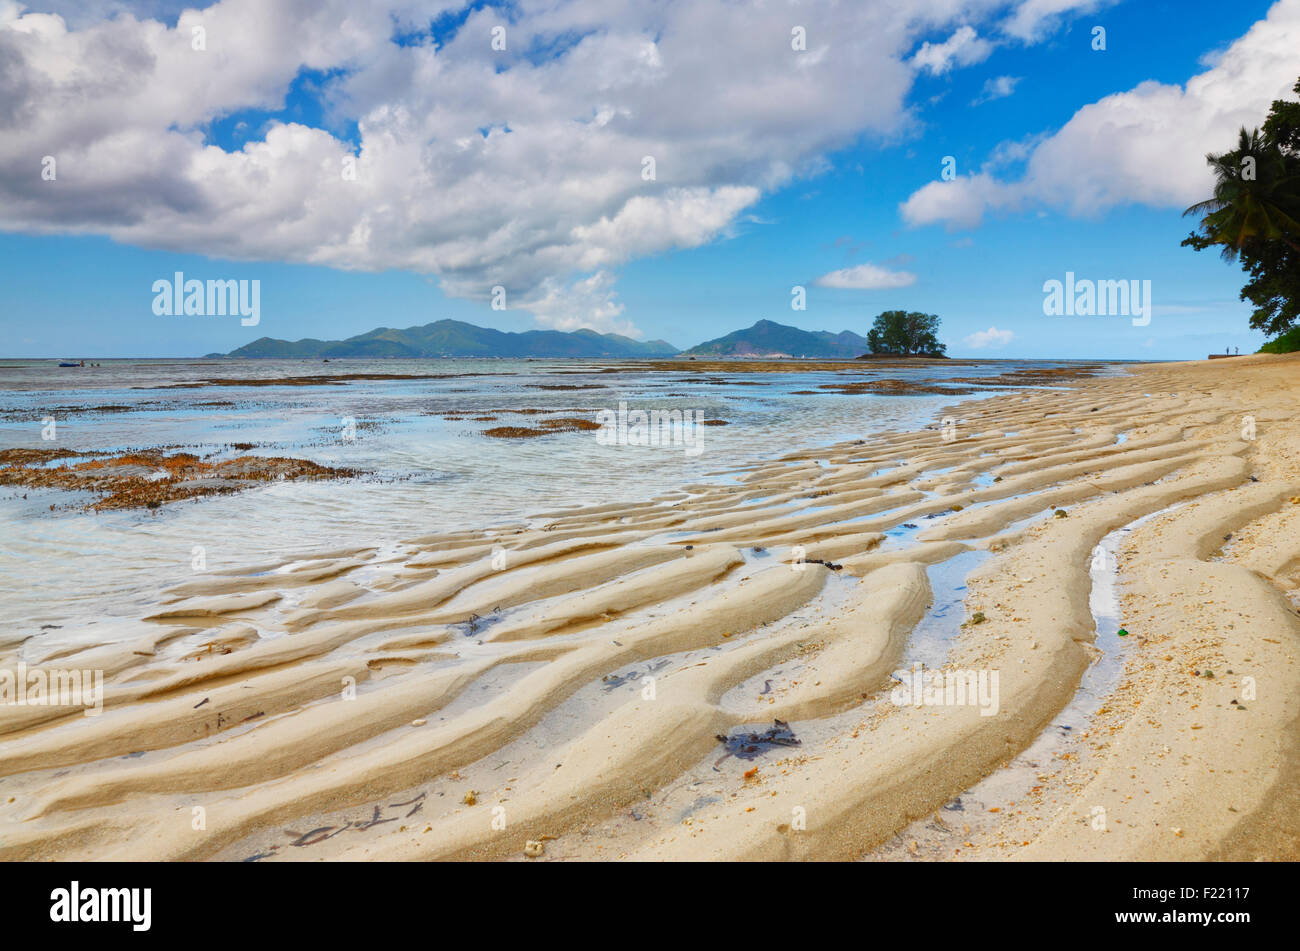 Düne am Strand, Insel La Digue, Seychellen. Stockbild